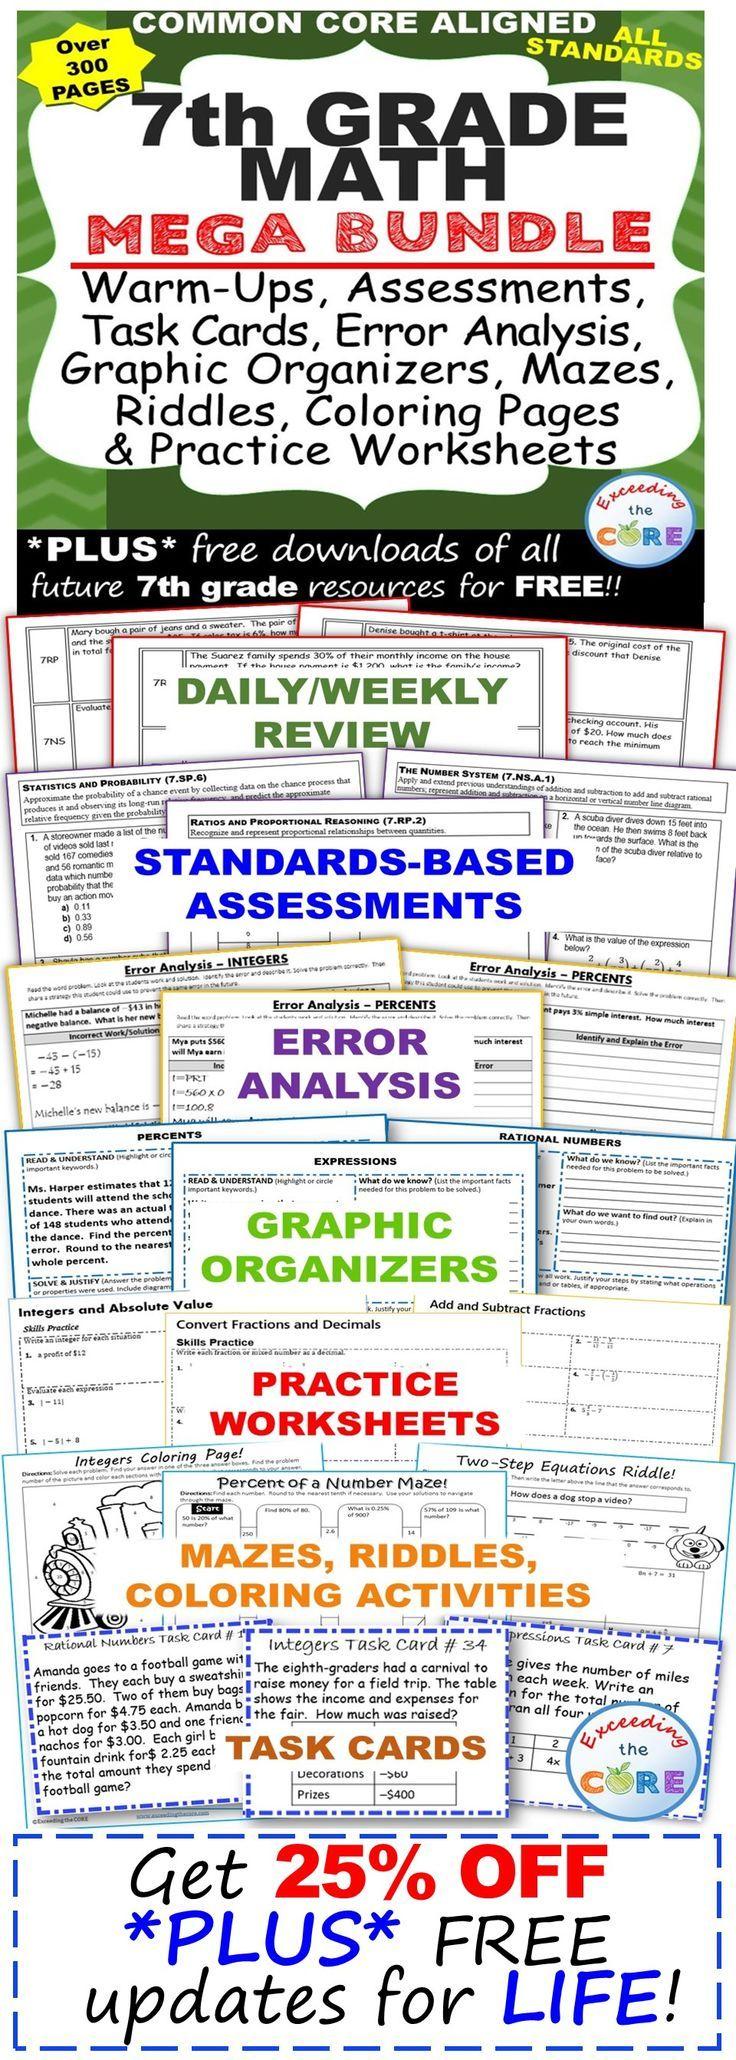 Free Worksheet Math Warm Up Worksheets die besten 17 ideen zu proportions worksheet auf pinterest 7th grade math common core assessments warm ups task cards error analysis